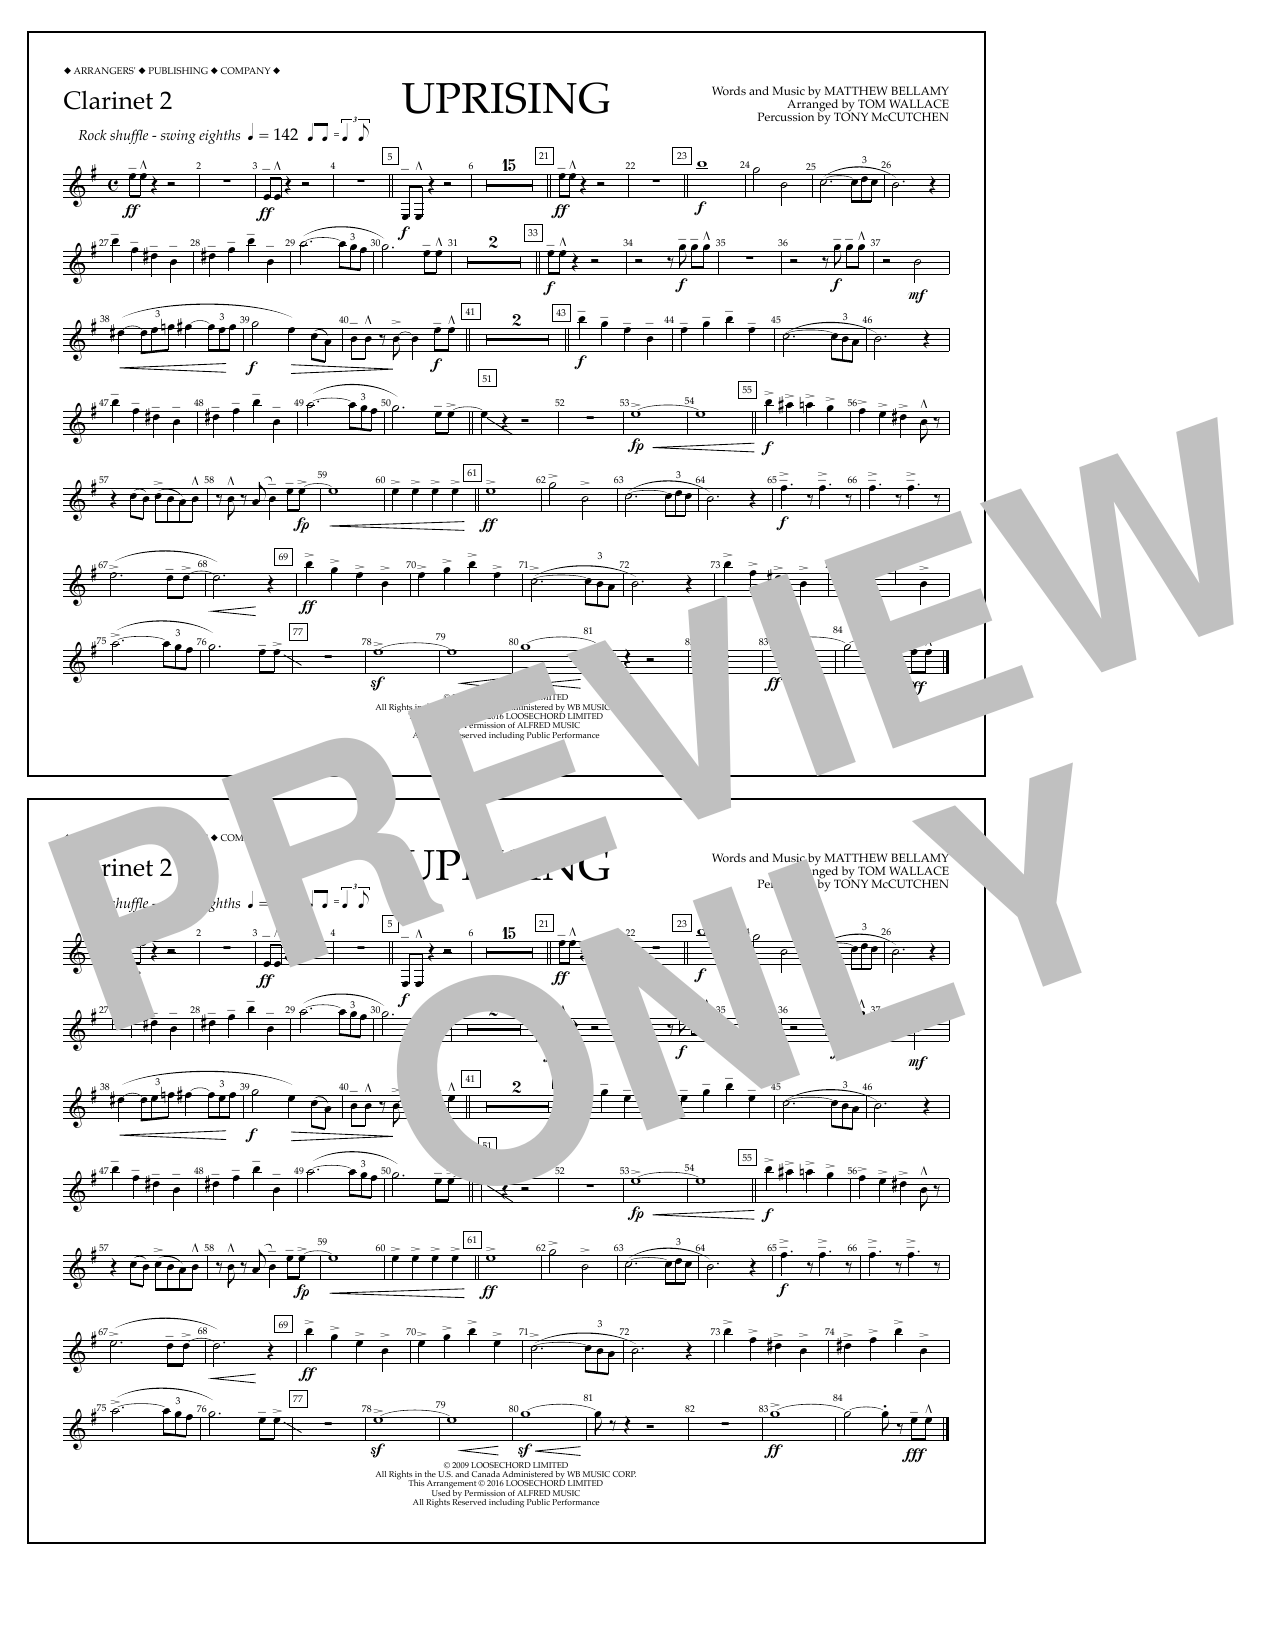 Muse - Uprising - Clarinet 2